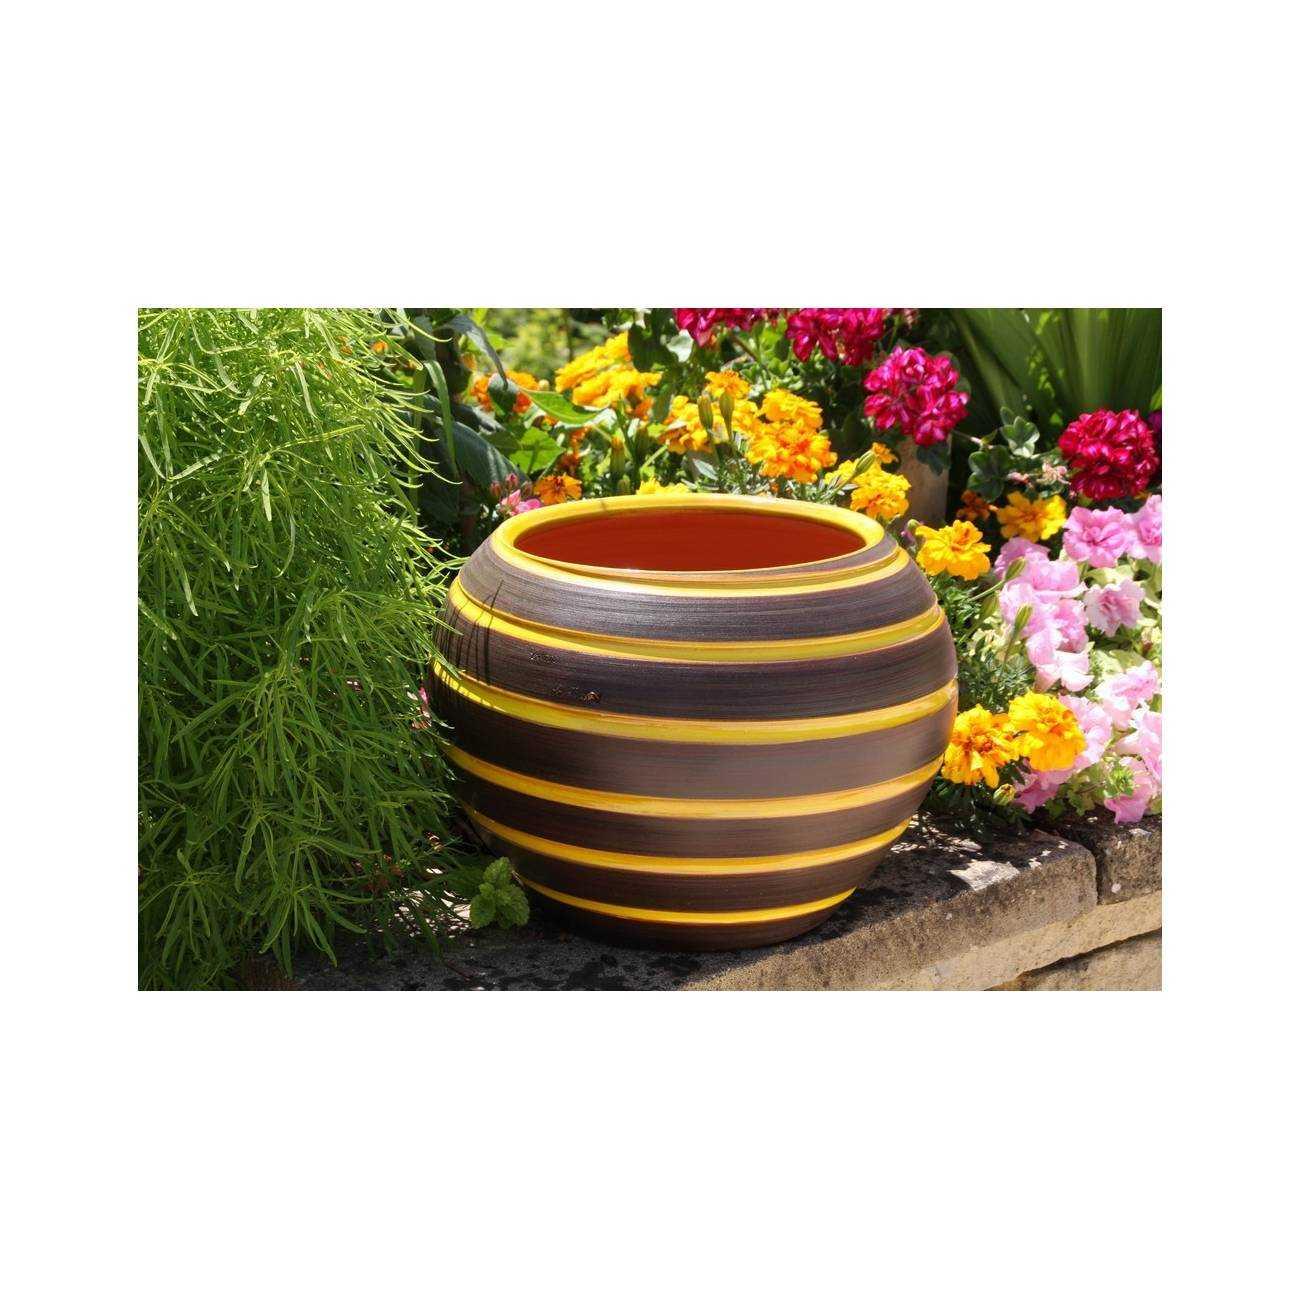 les maldives terre de soleil vase jaune les poteries d 39 albi. Black Bedroom Furniture Sets. Home Design Ideas